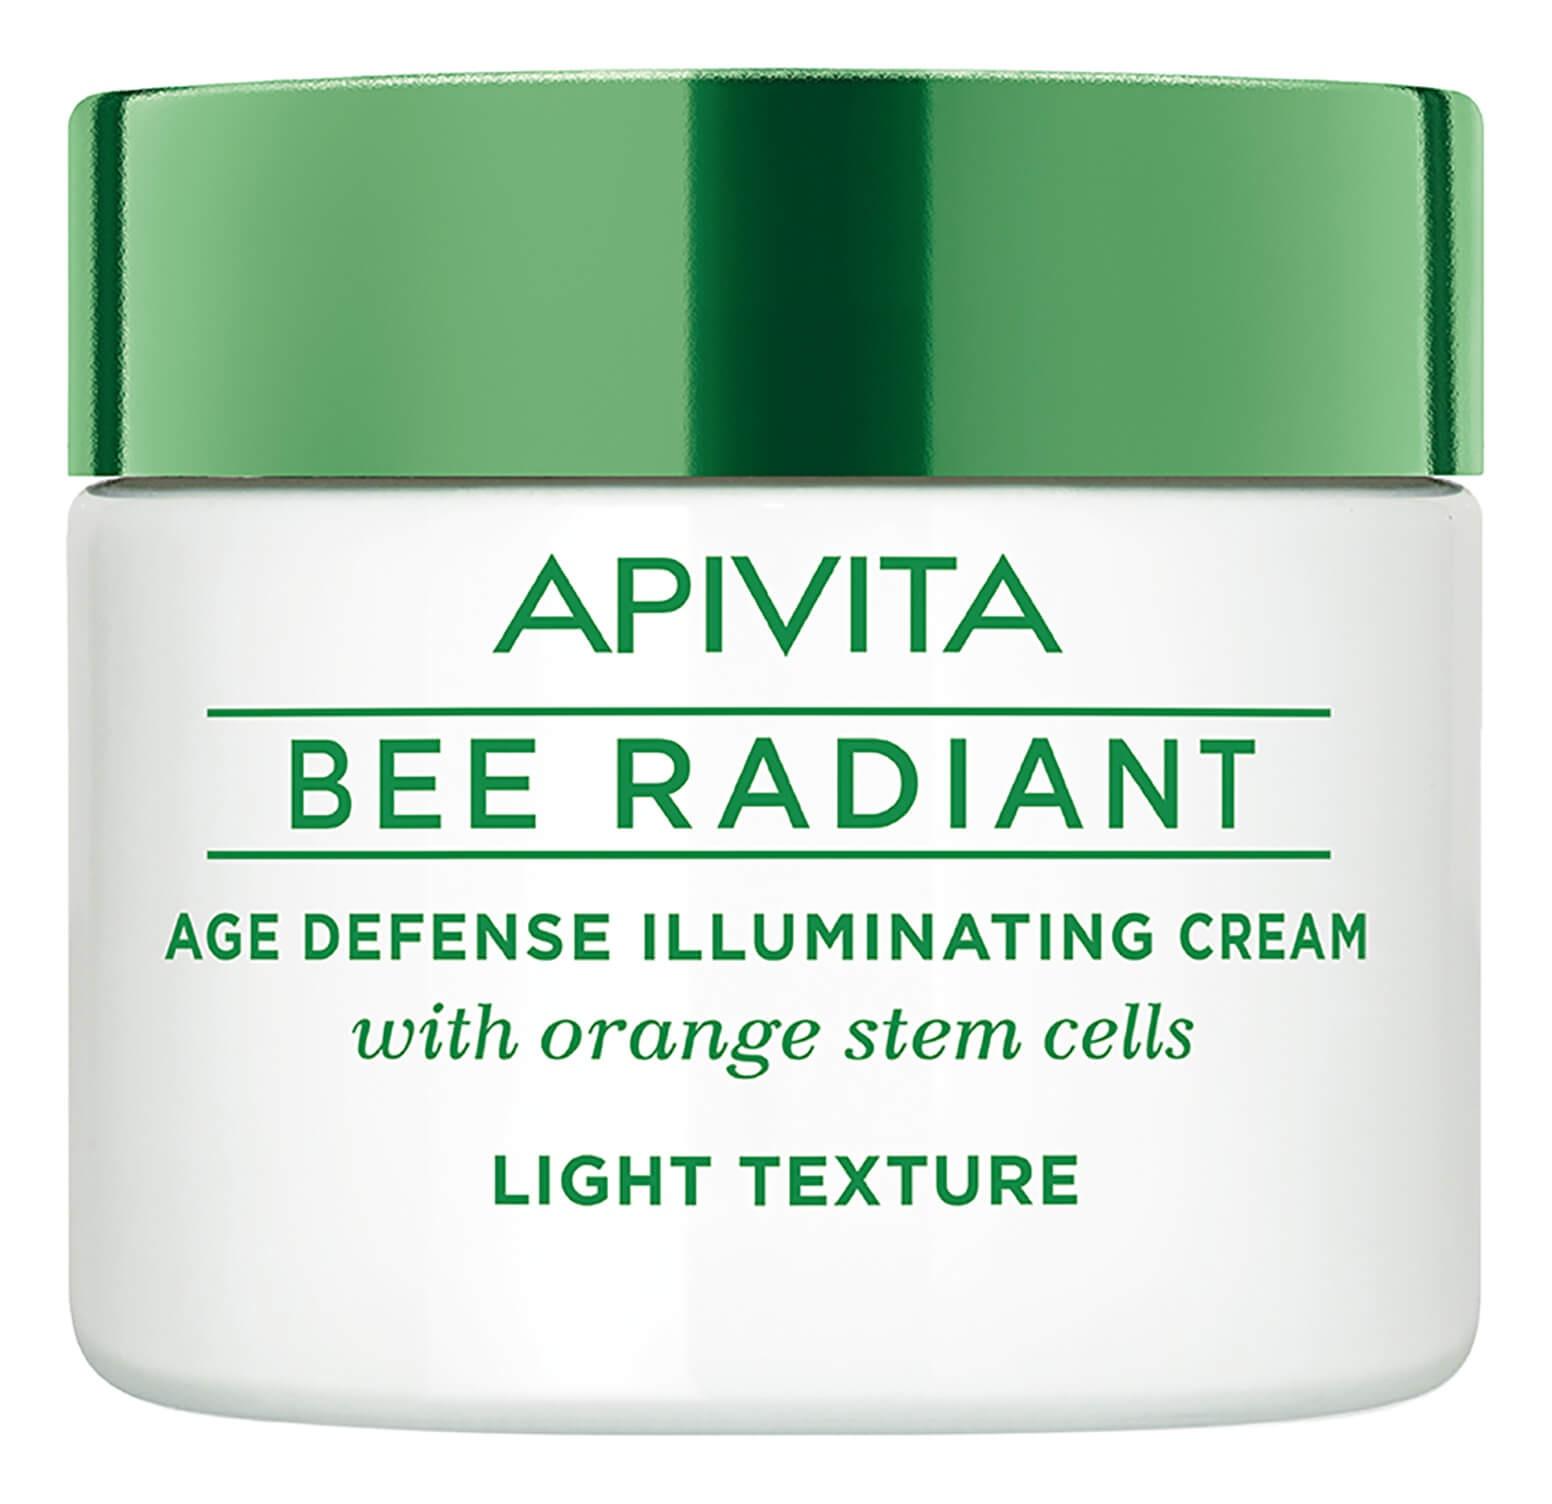 Apivita Bee Radiant Cream, Light Texture